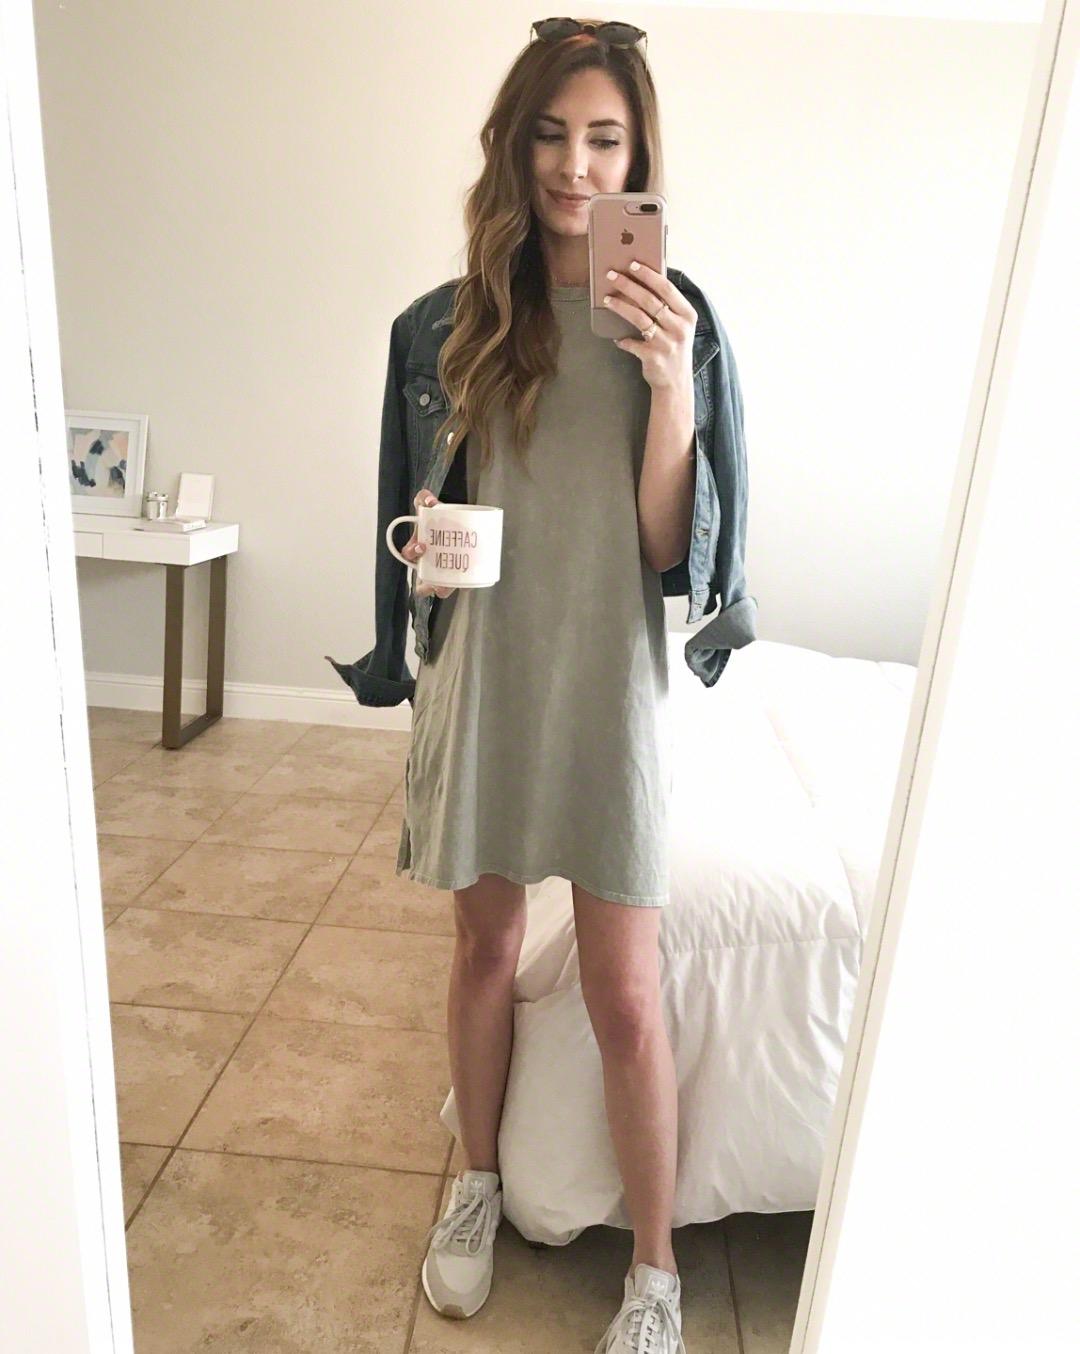 Casual OOTD - Dress + Denim Jacket